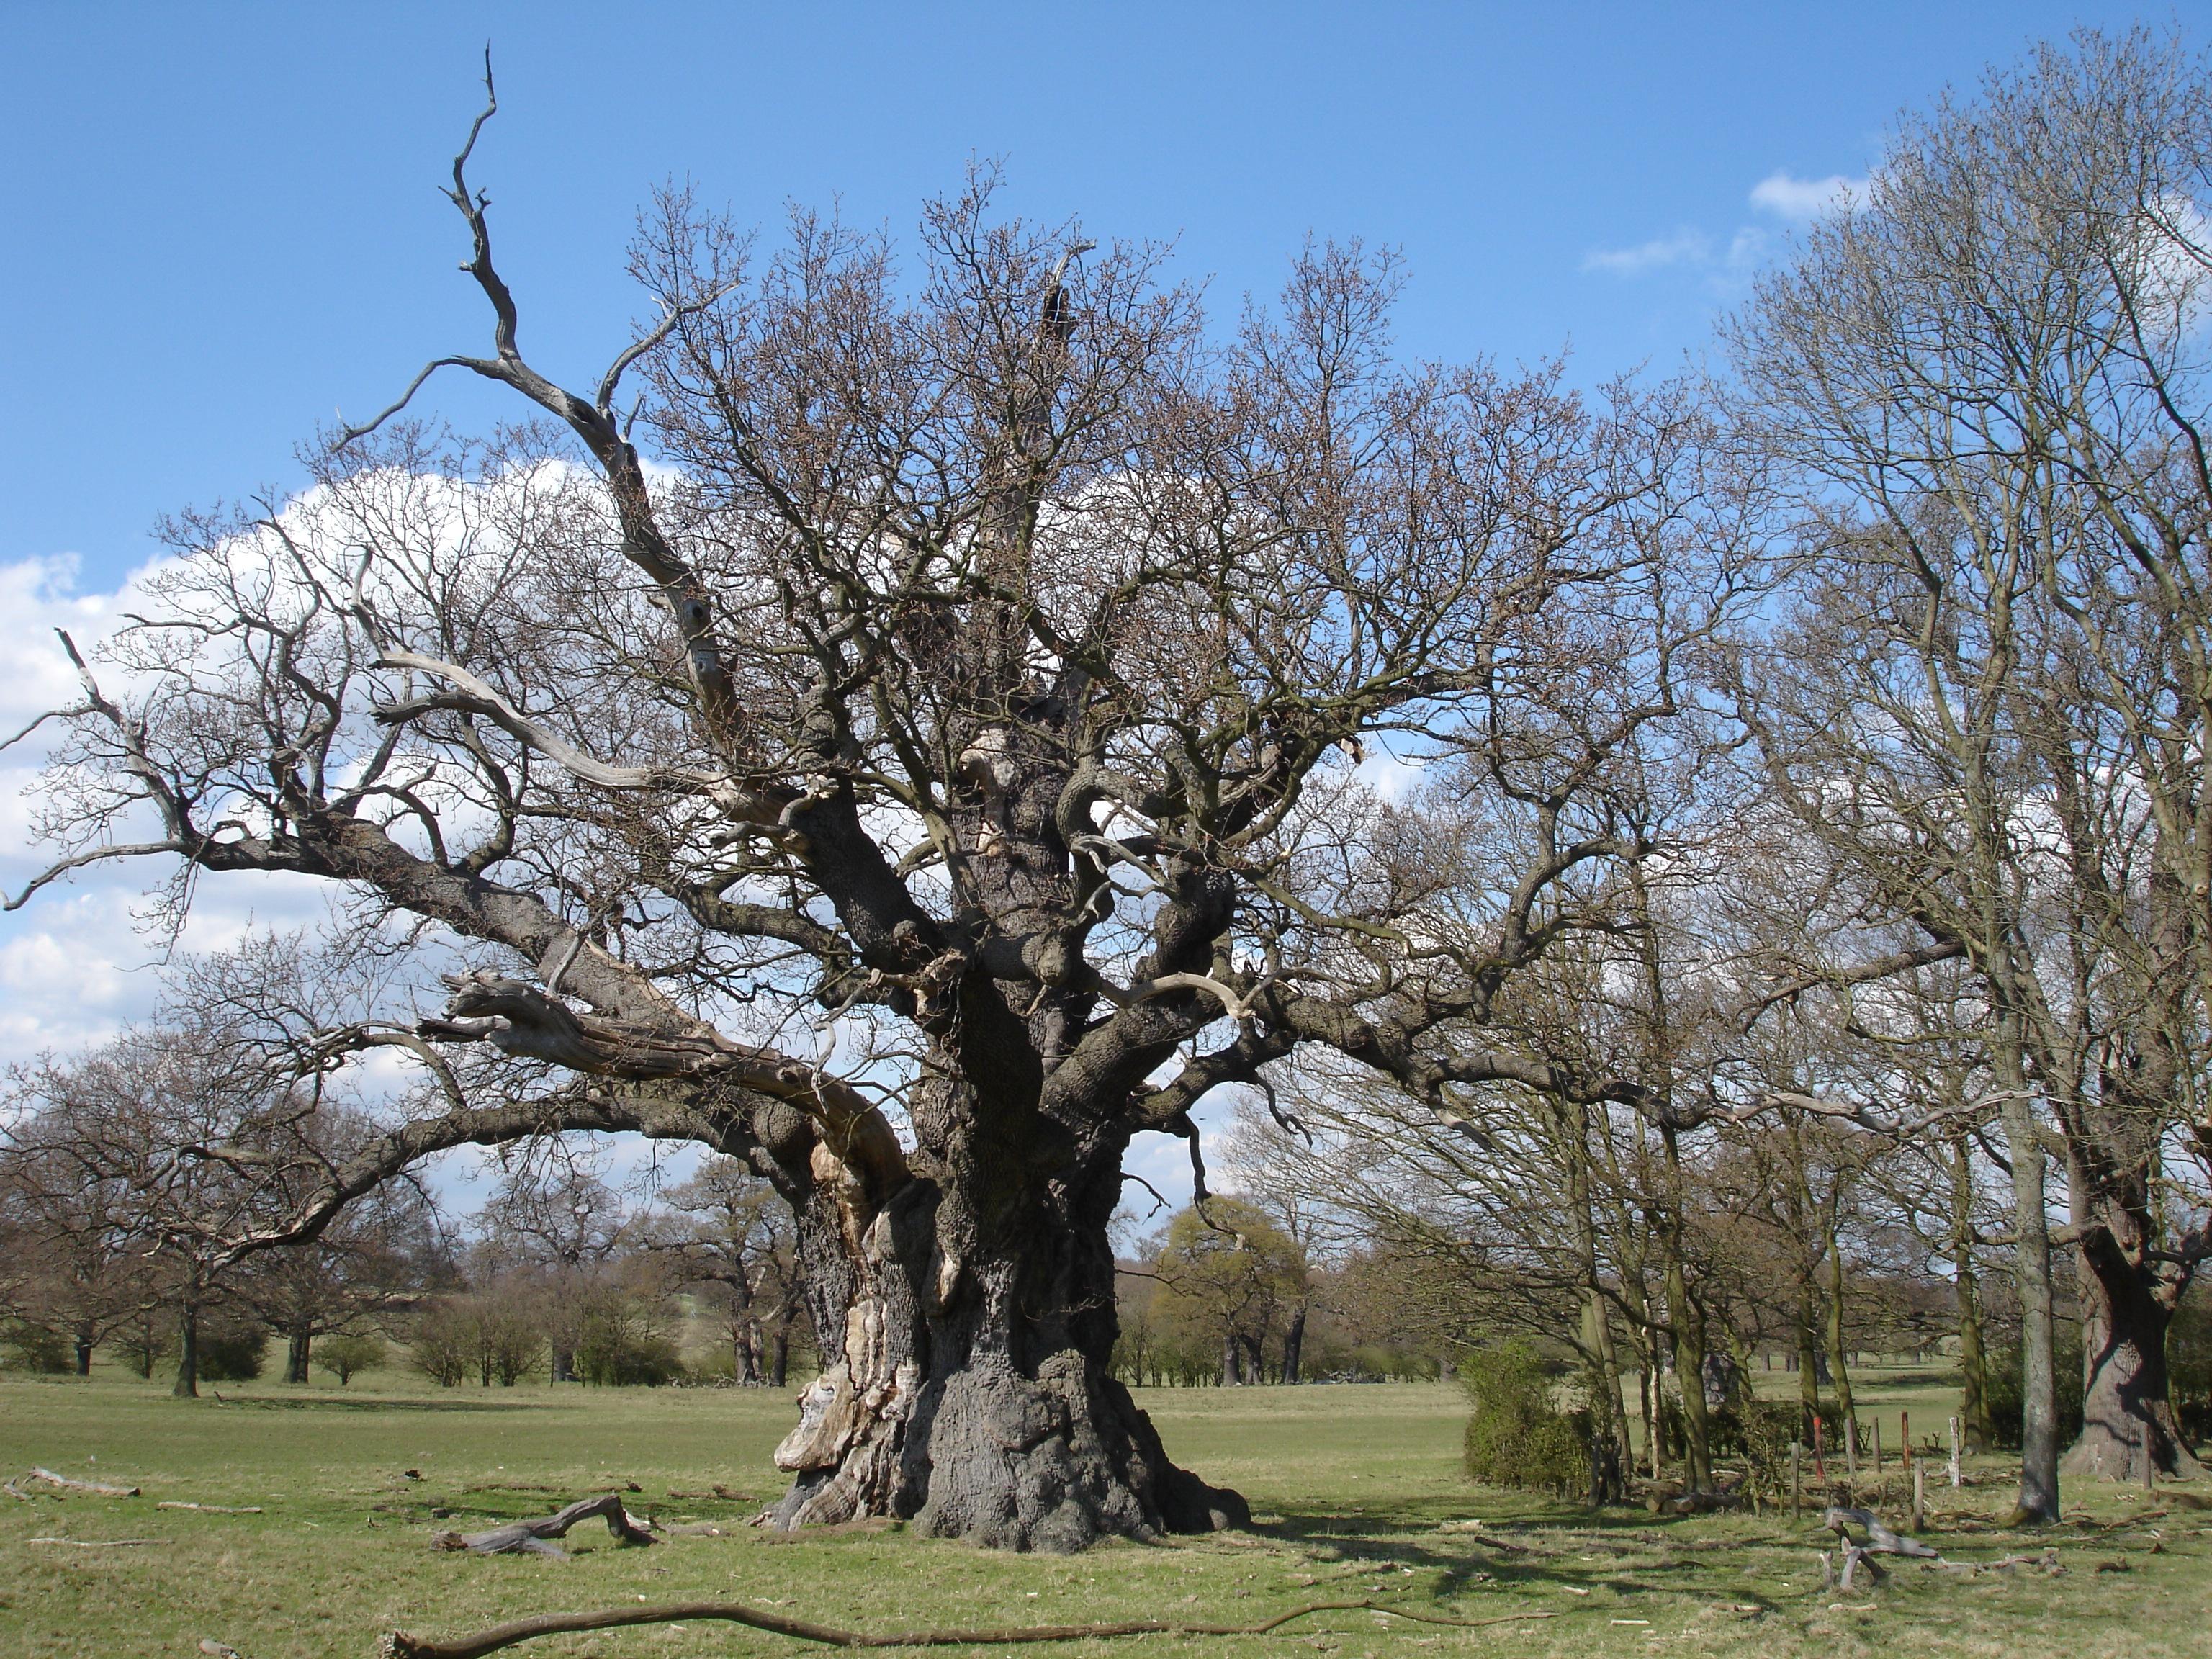 Pechanga Great Oak Tree Tour